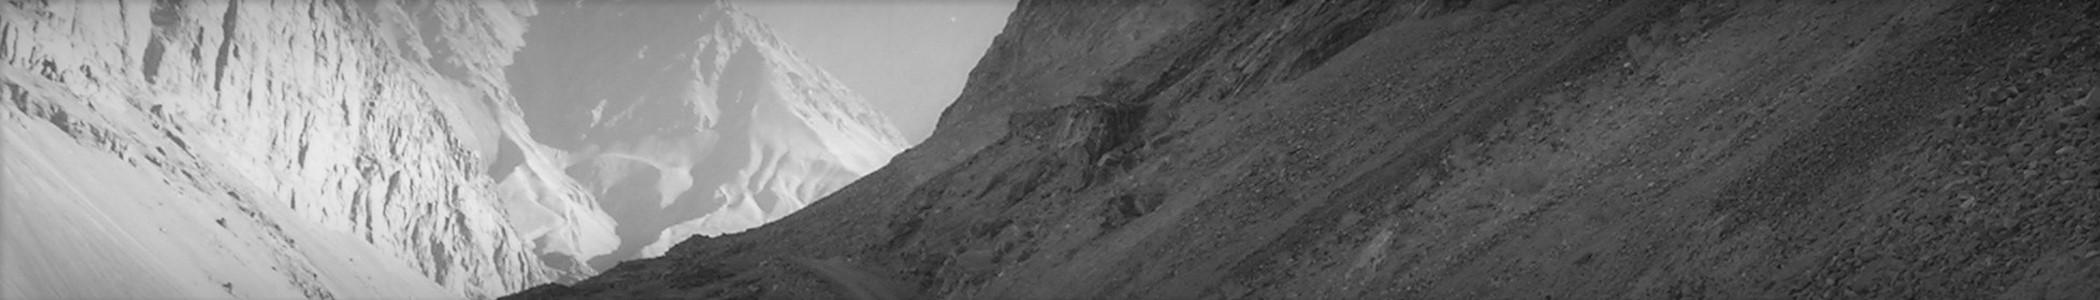 mountainroad.jpg